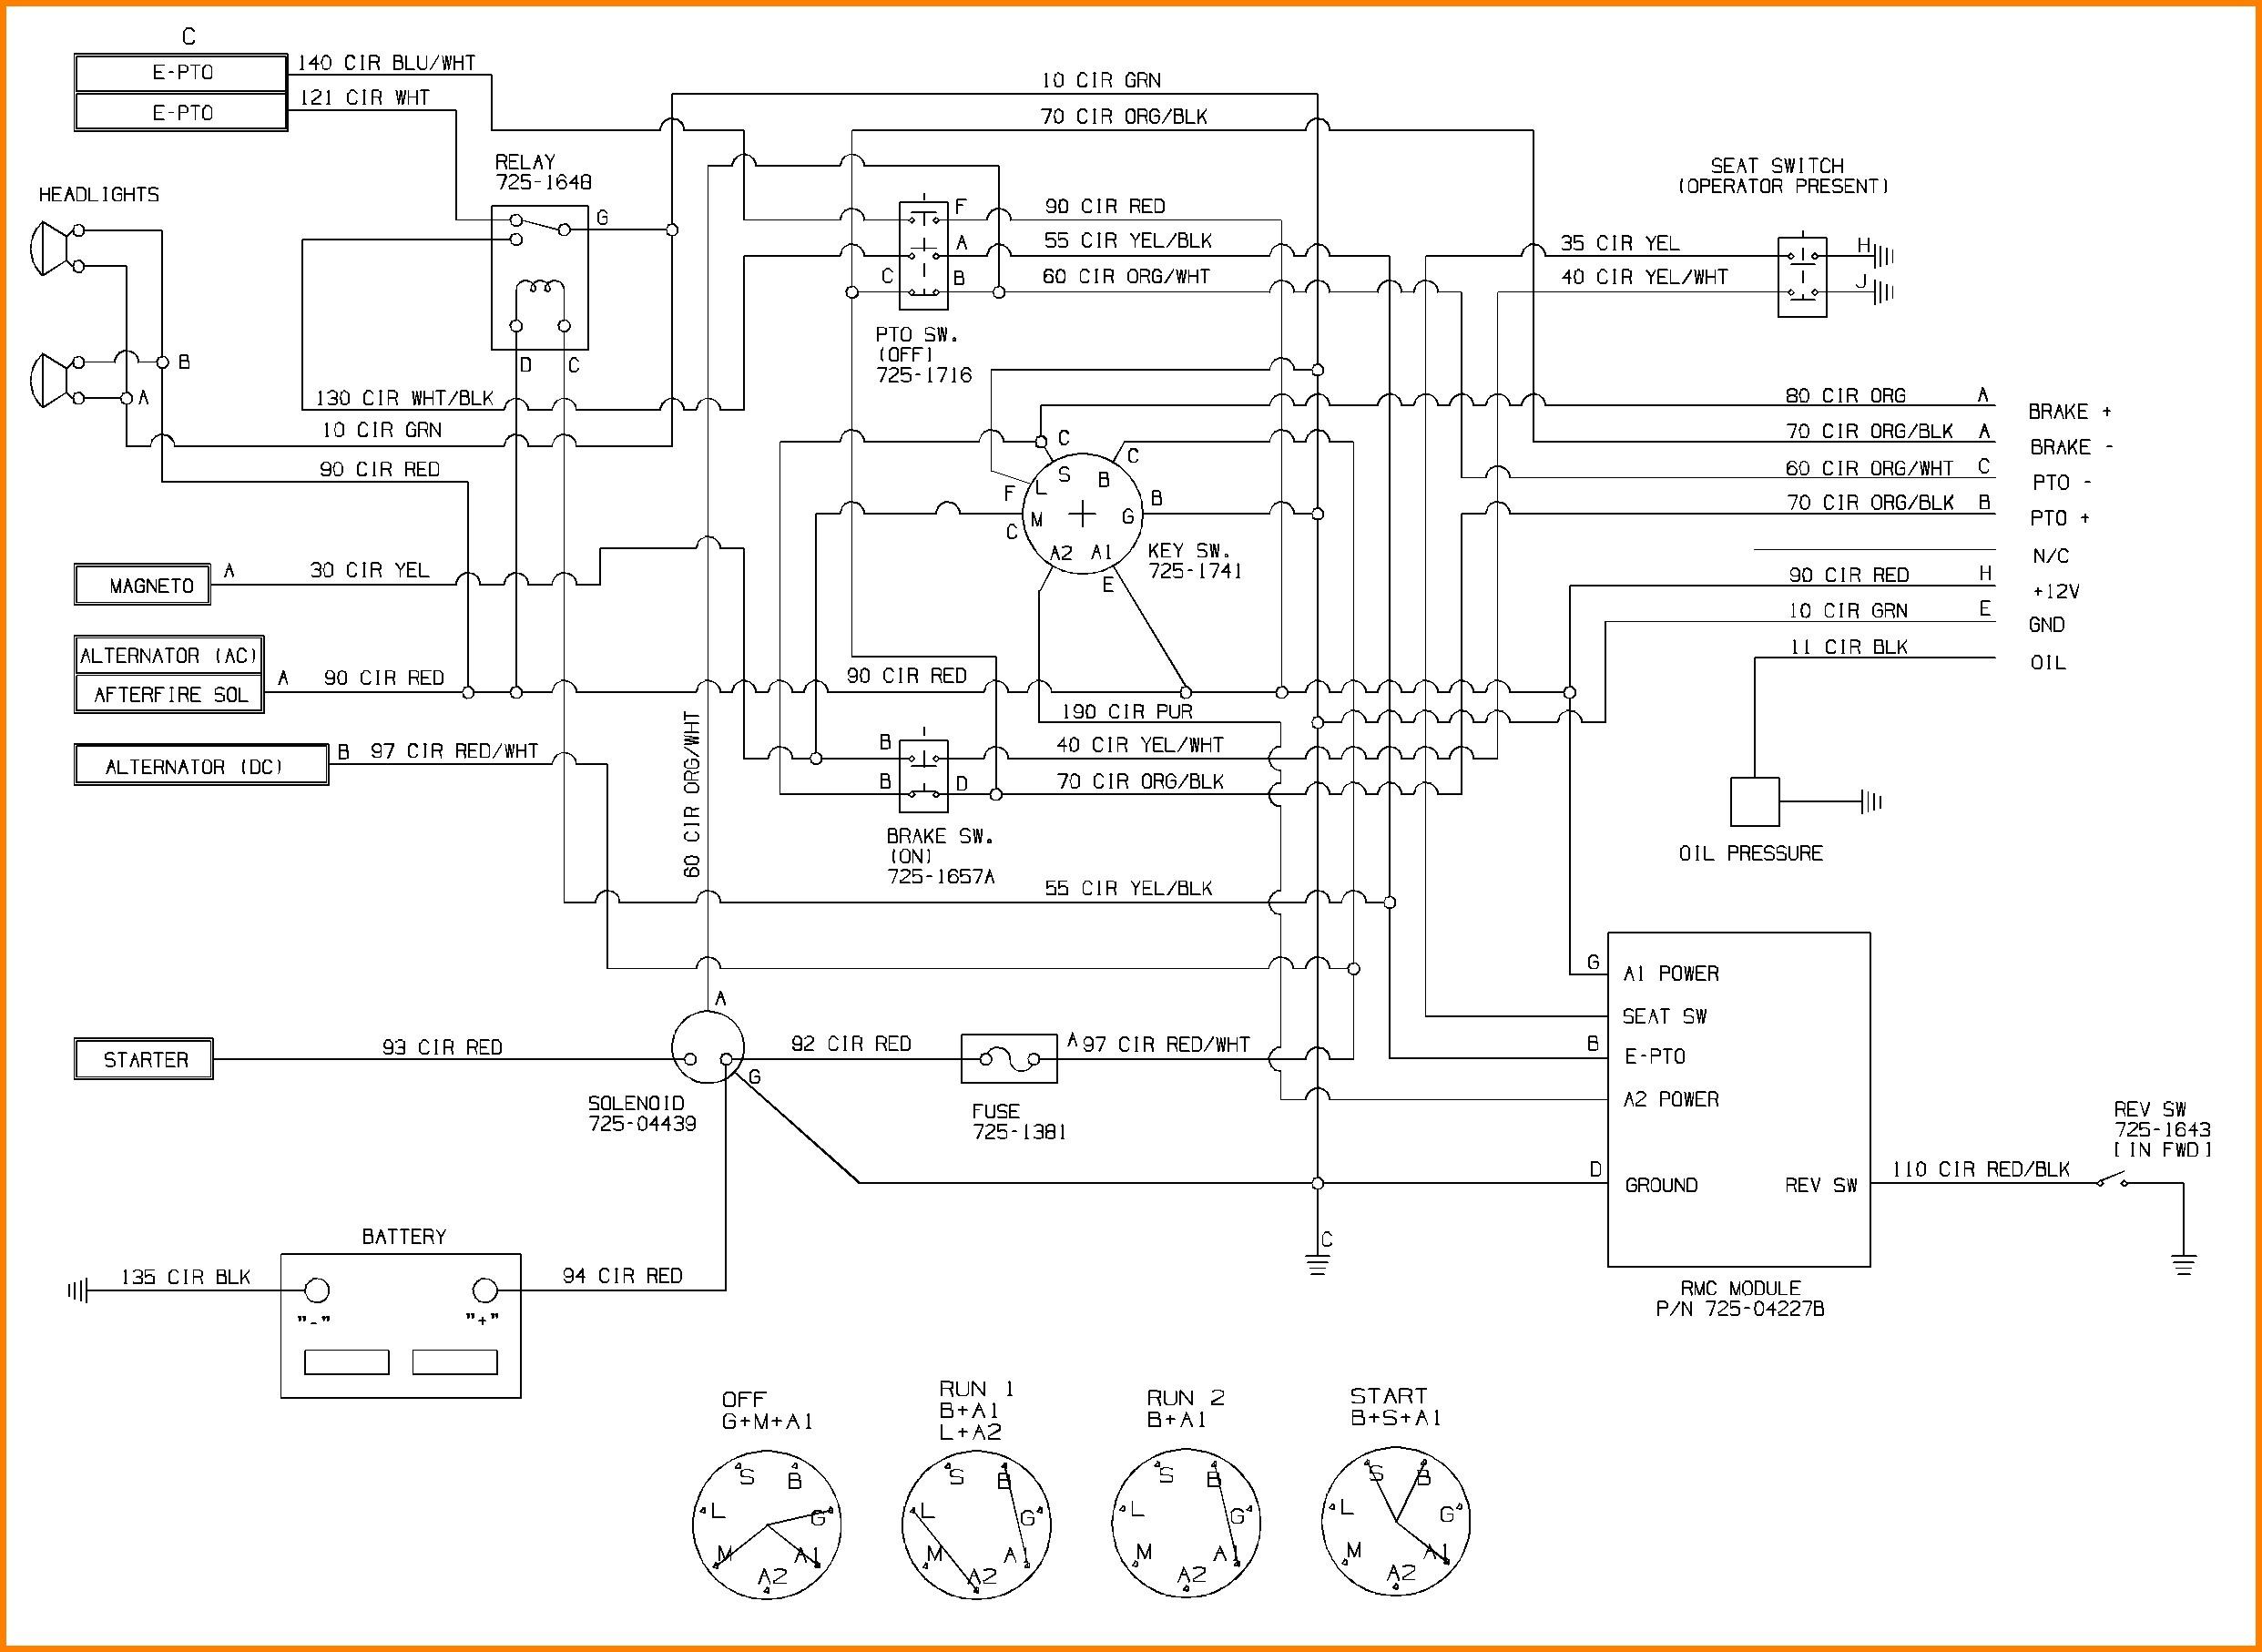 DIAGRAM] Cub Cadet 1045 Wiring Diagram Model FULL Version HD Quality Diagram  Model - NISSANDIAGRAMS.LIBERAMENTEONLUS.ITDiagram Database - liberamenteonlus.it